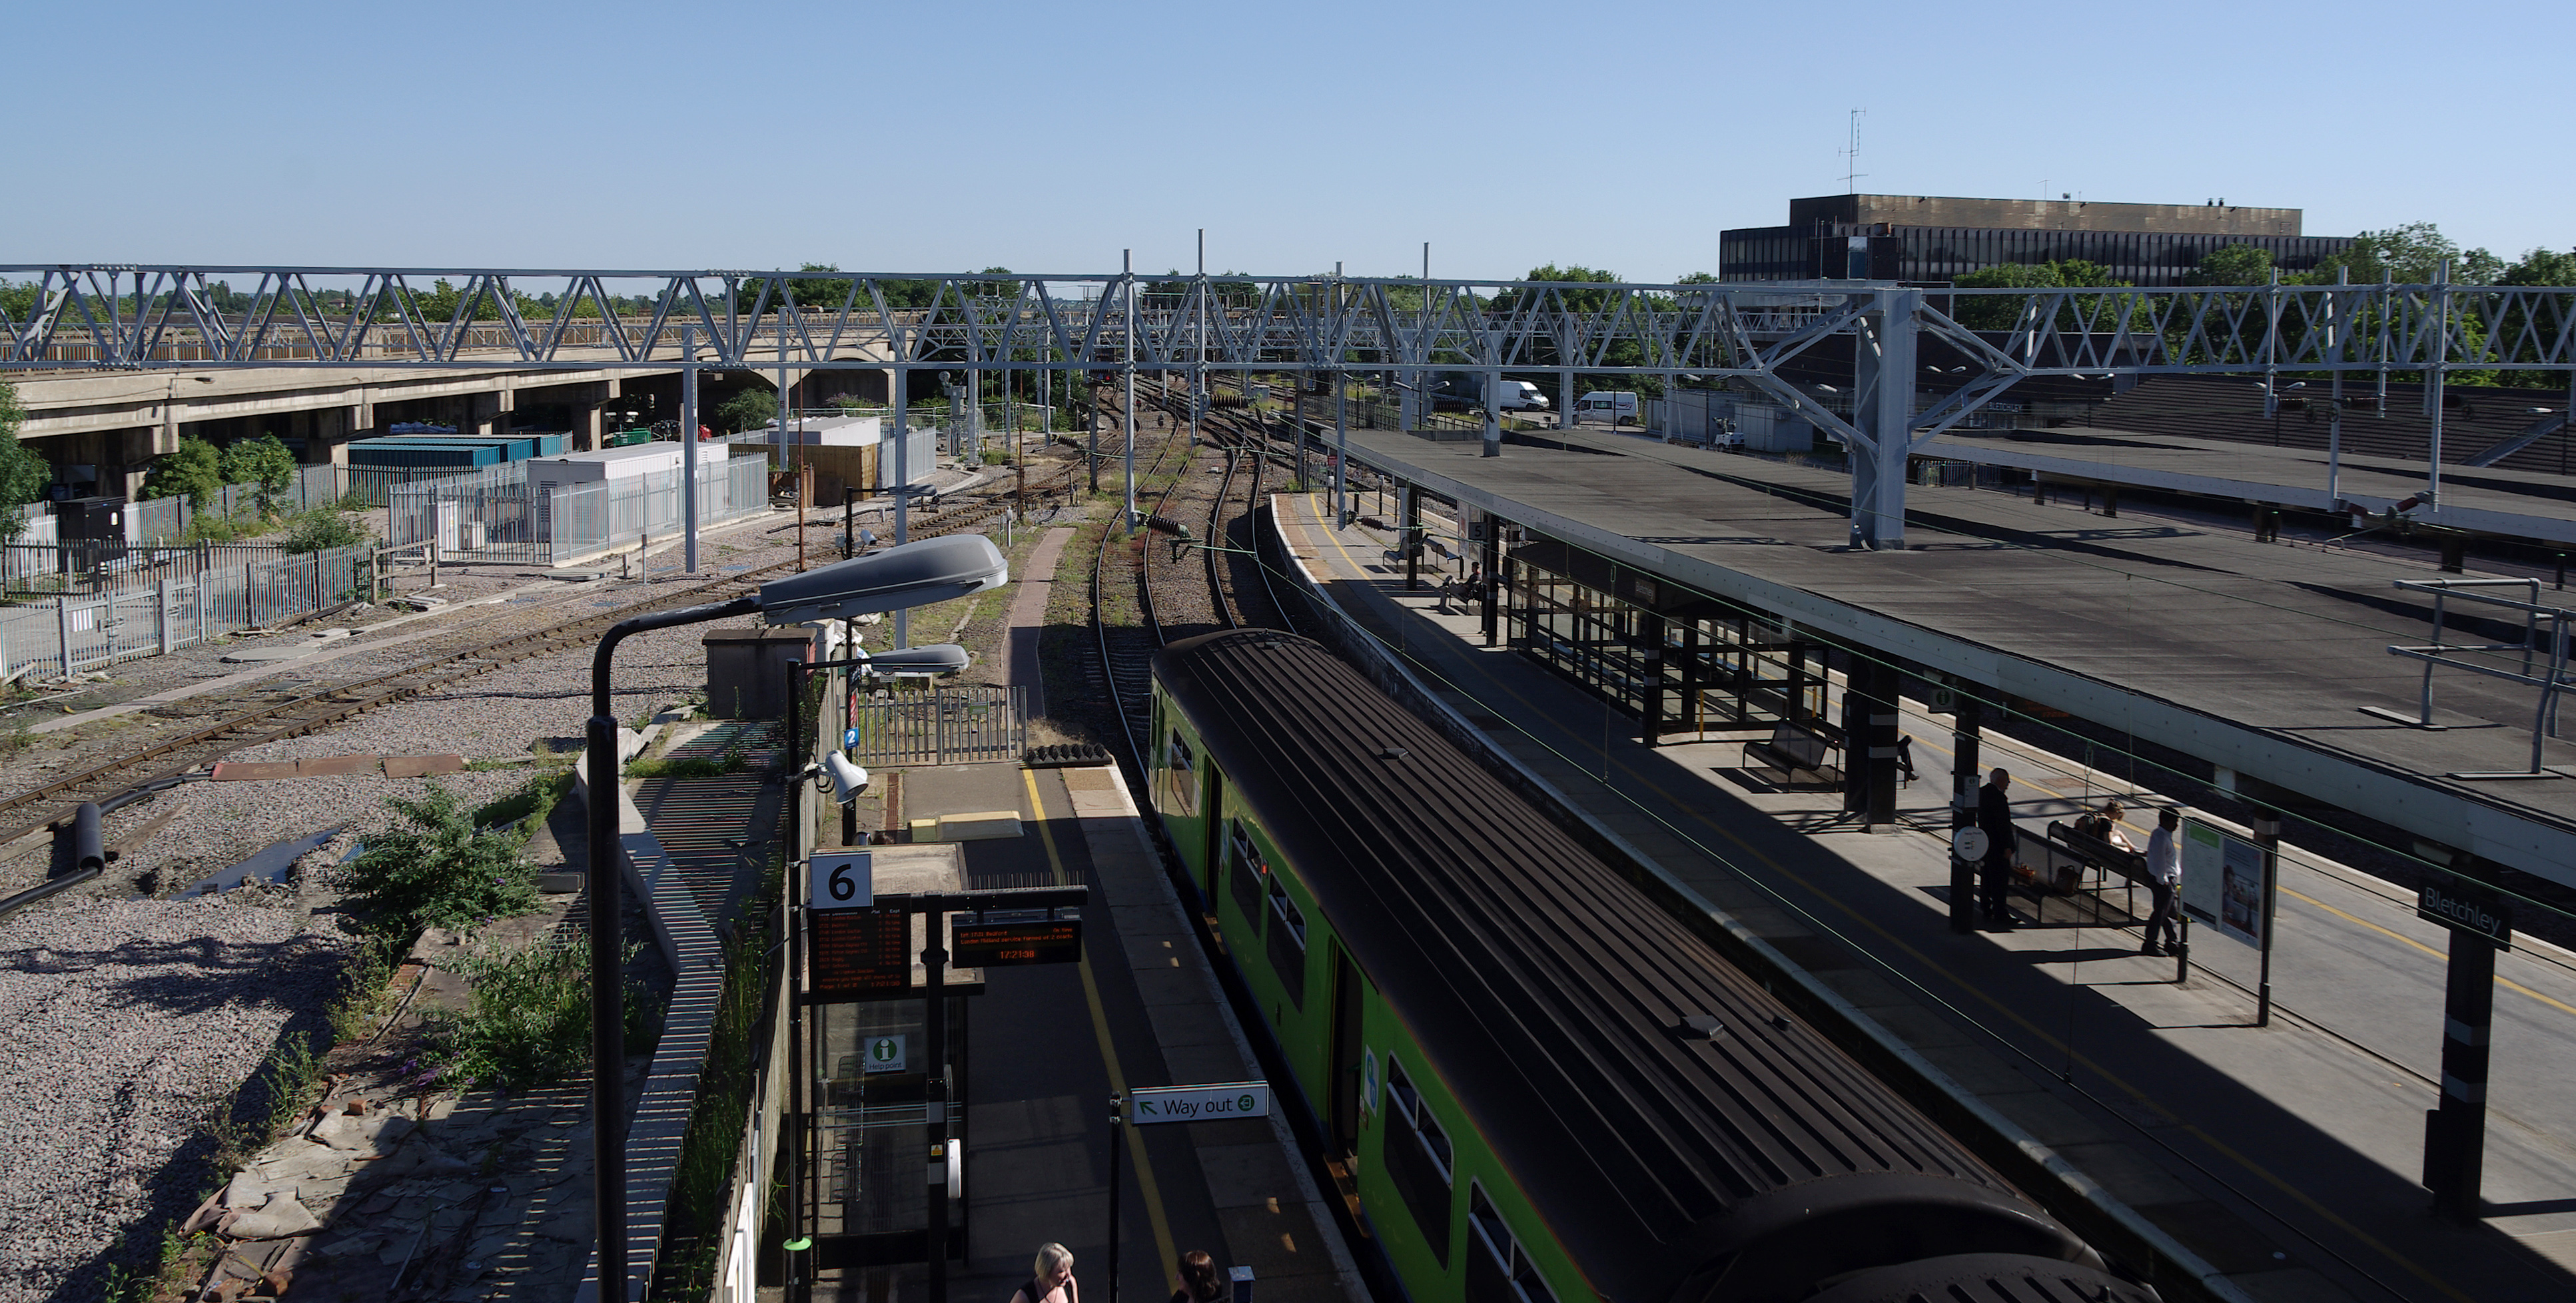 File Bletchley Railway Station Mmb 05 150109 Jpg